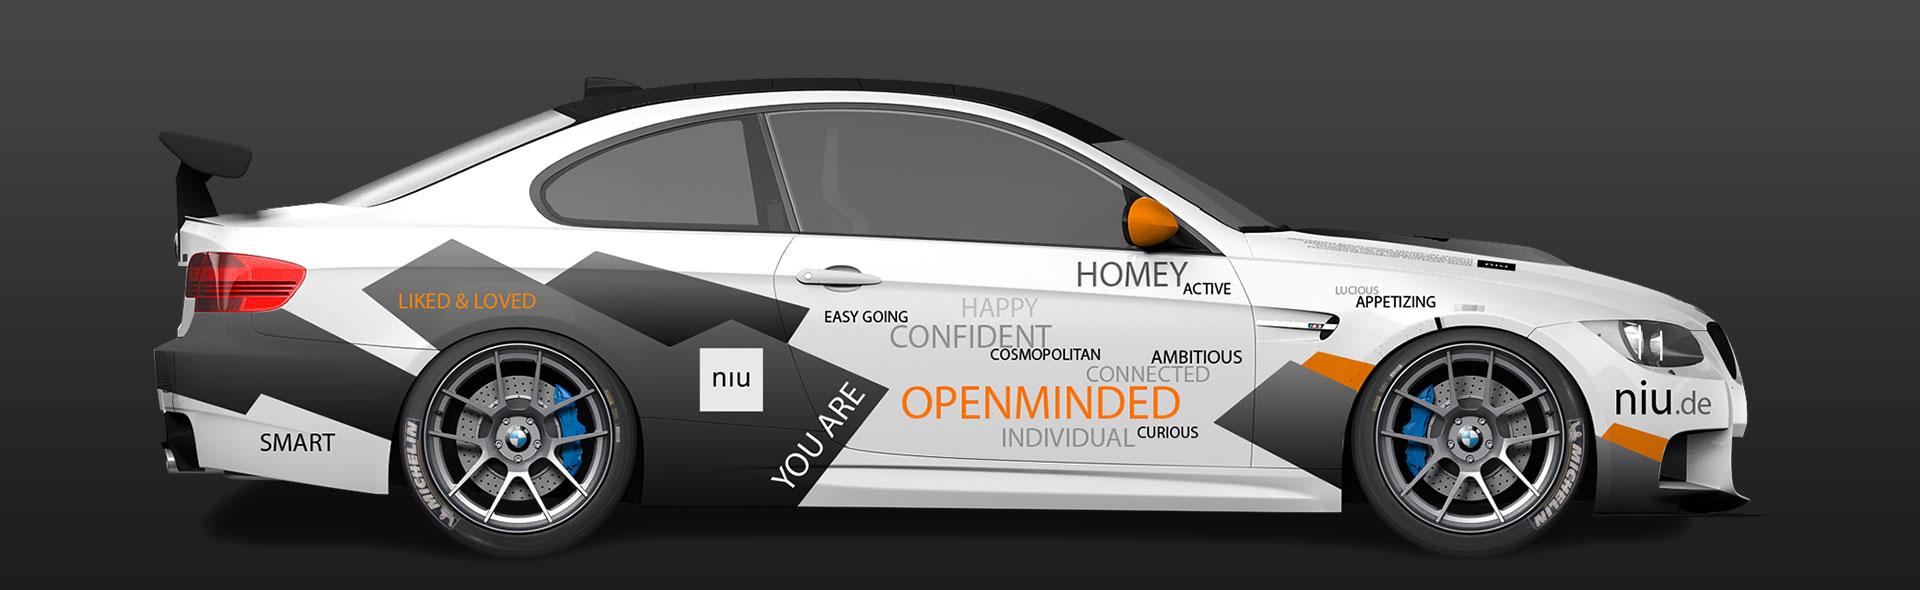 debleu - Motorsport-Design/ Race Car Livery